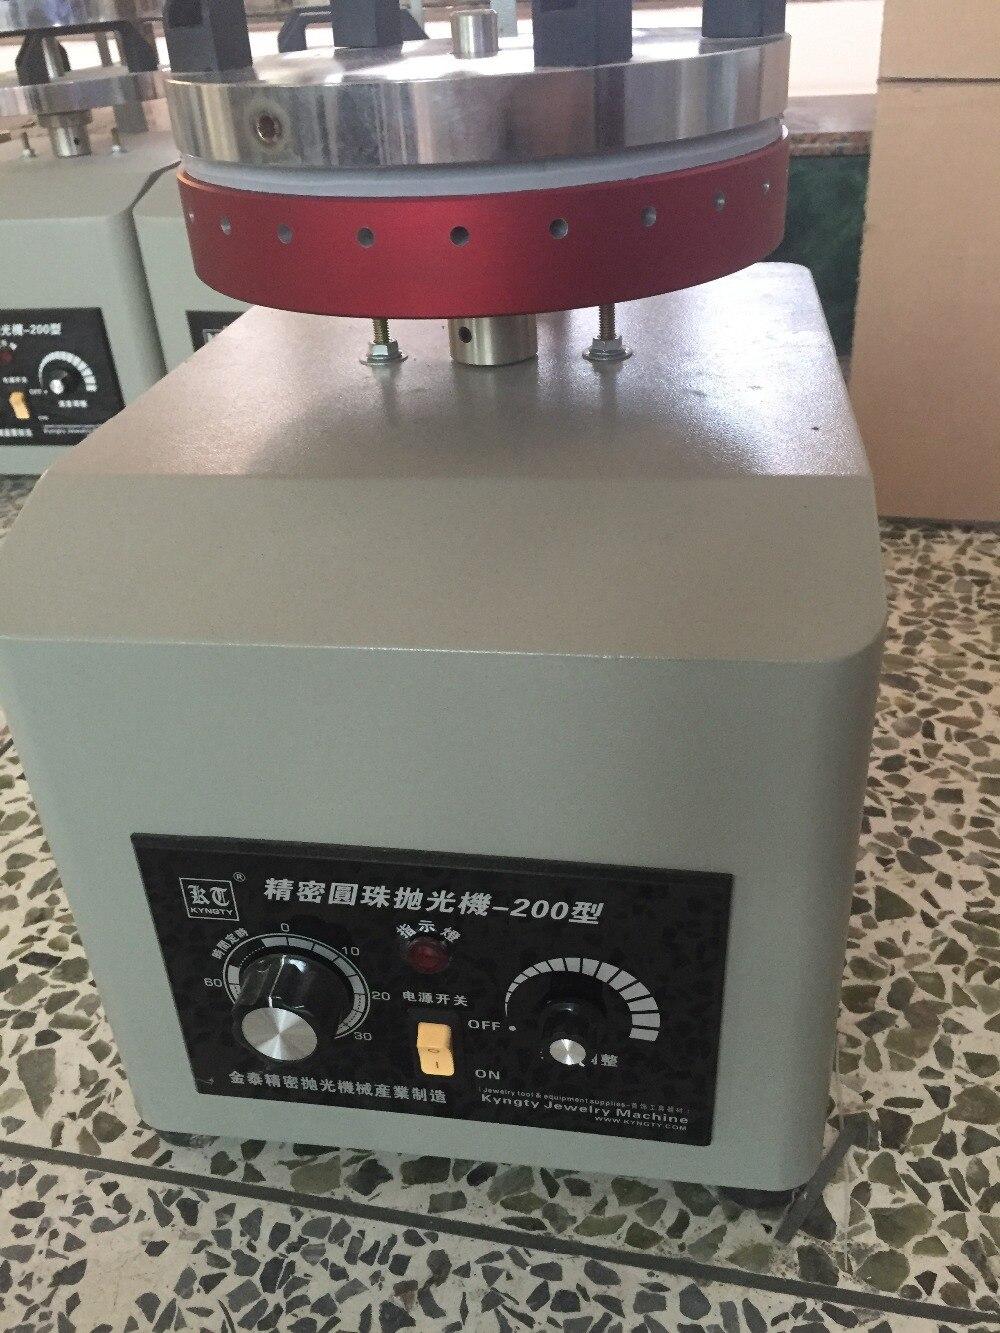 цена на round beads polisher jewelry polishing machine,Rotary Rock Tumbler,wood beads grinding engraving cleaning burnishing drum